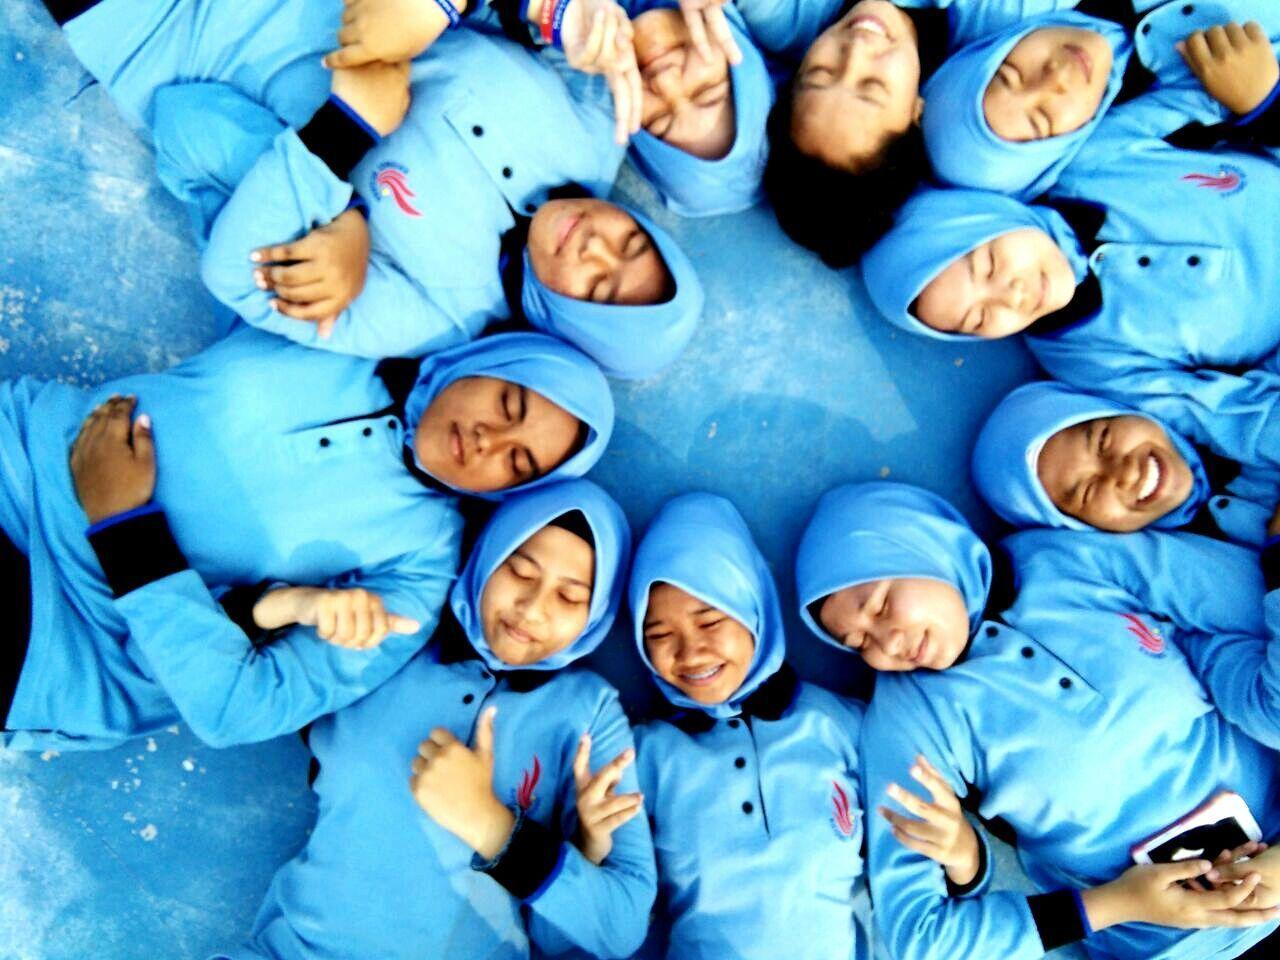 My Year My View Disember2016 Disember EyeEm EyeEmGalley EyeEm Malaysia Malaysia Selangor, Malaysia